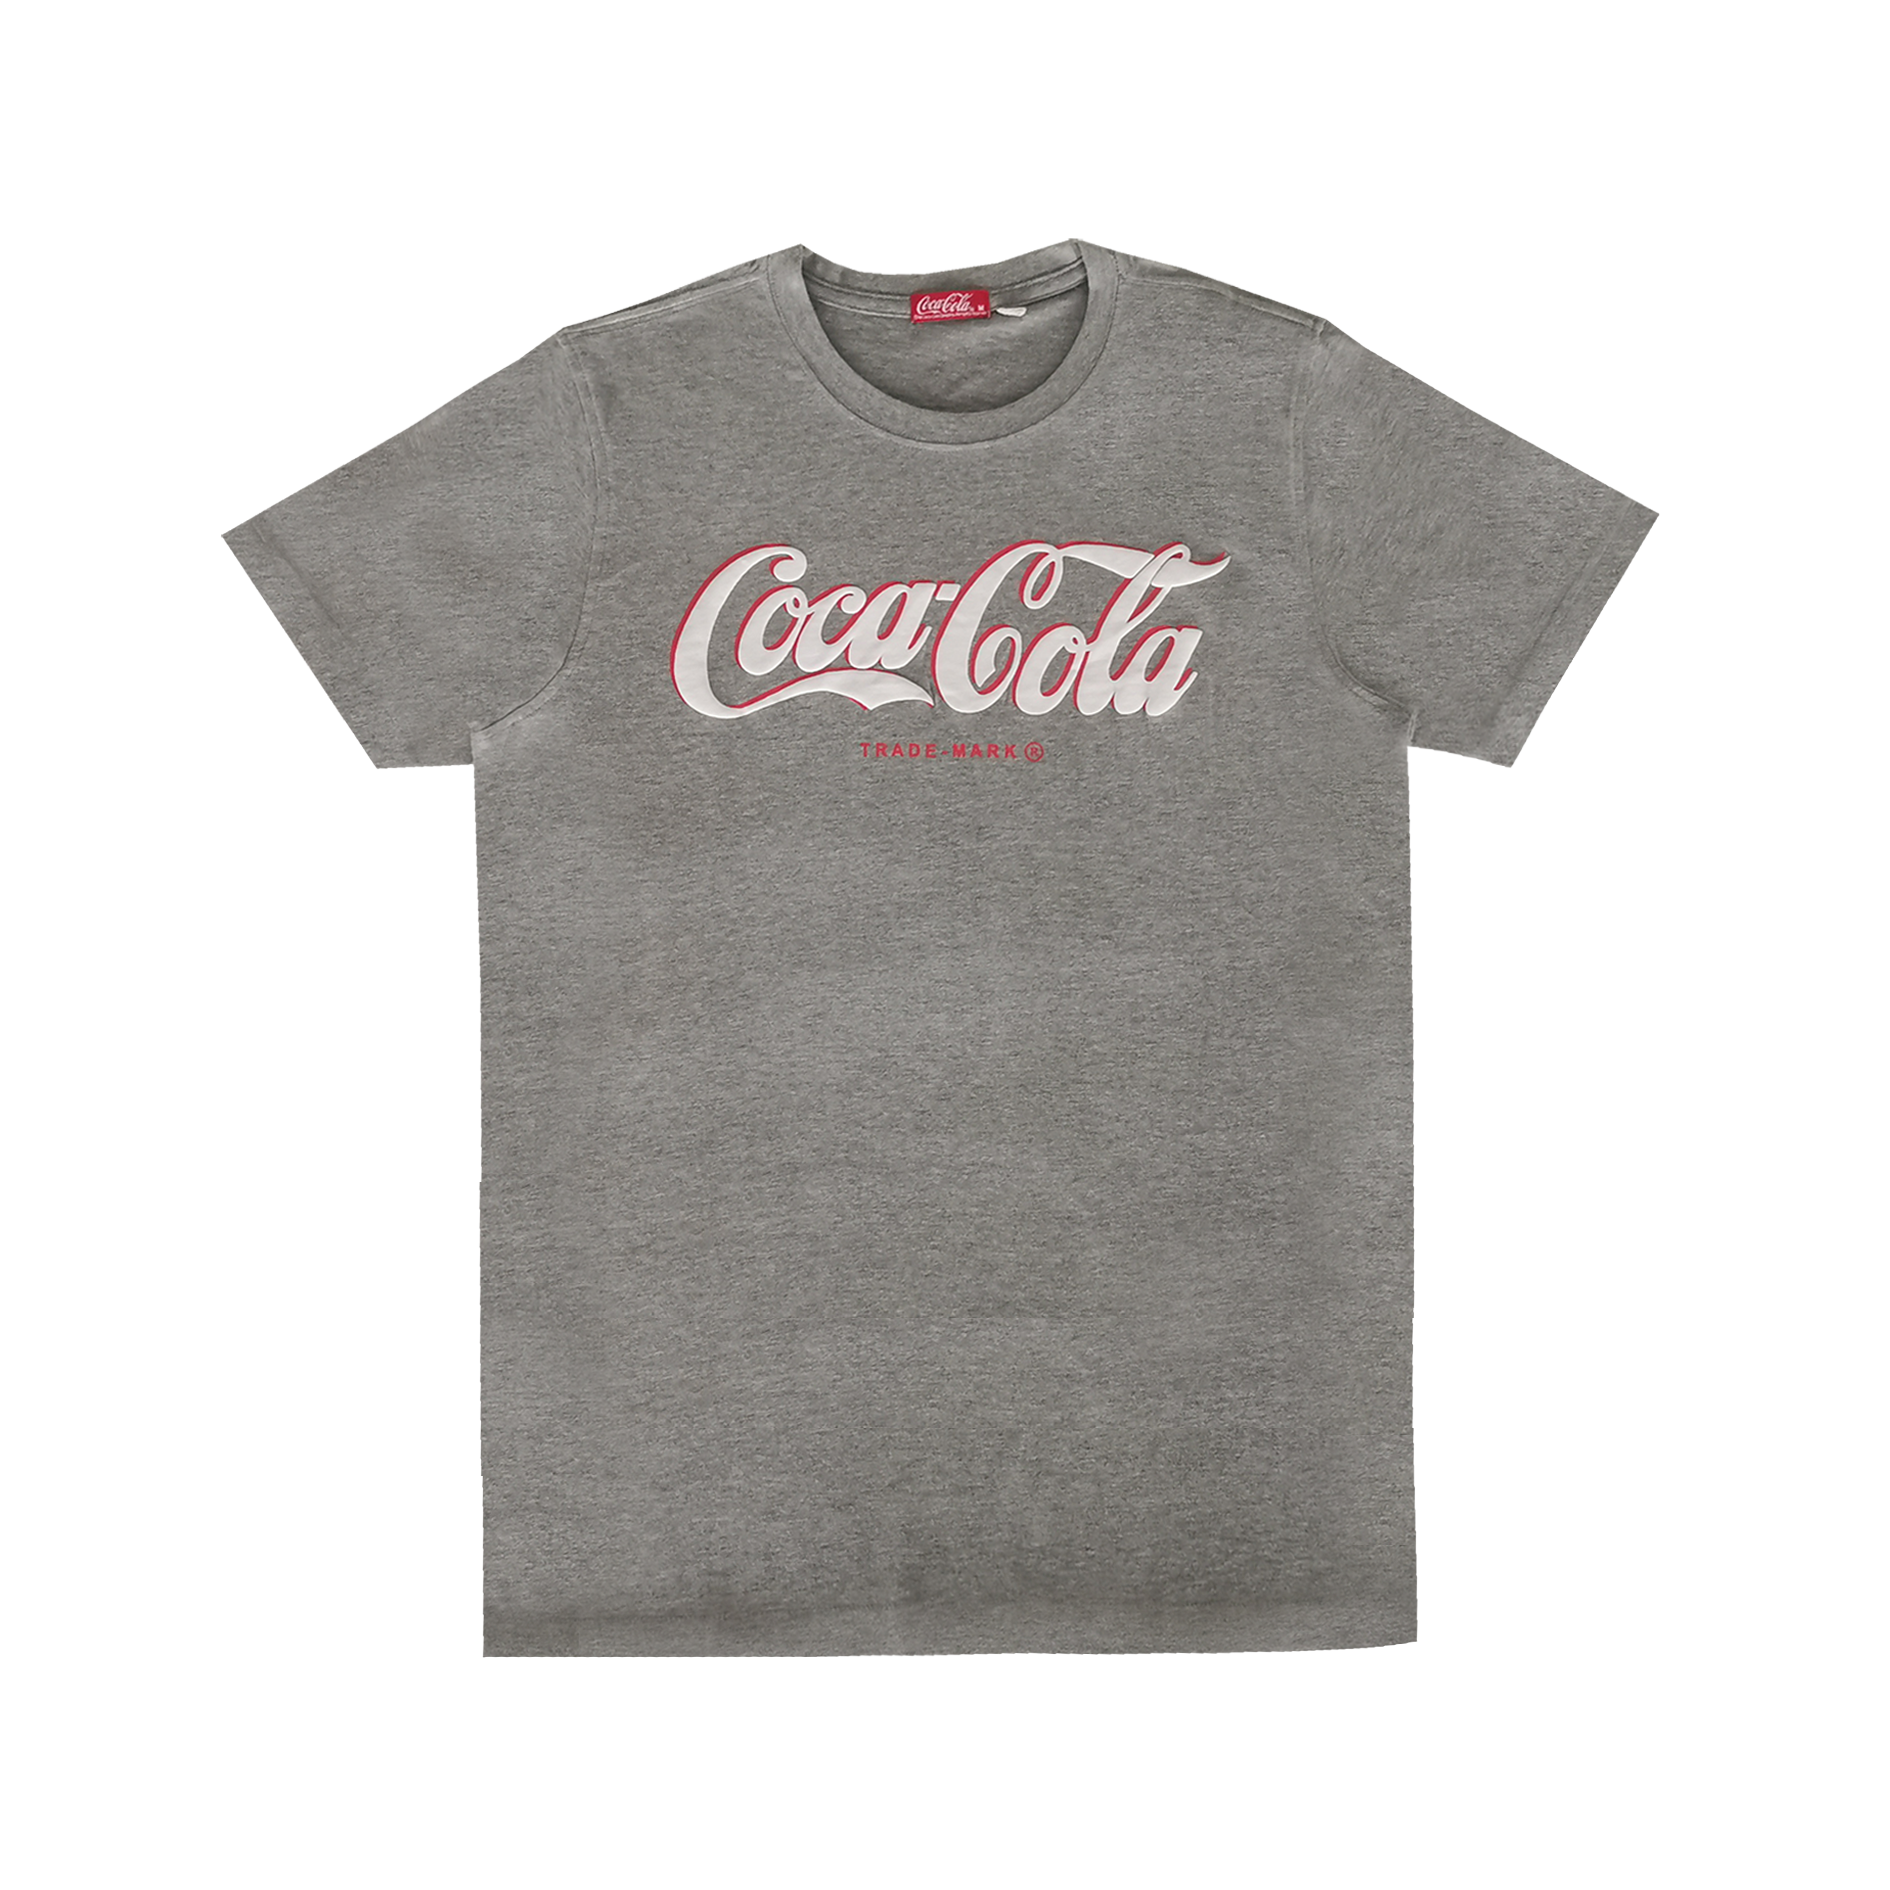 330dde1a3 Coca-Cola Man Graphic T-Shirt - COMMON SENSE